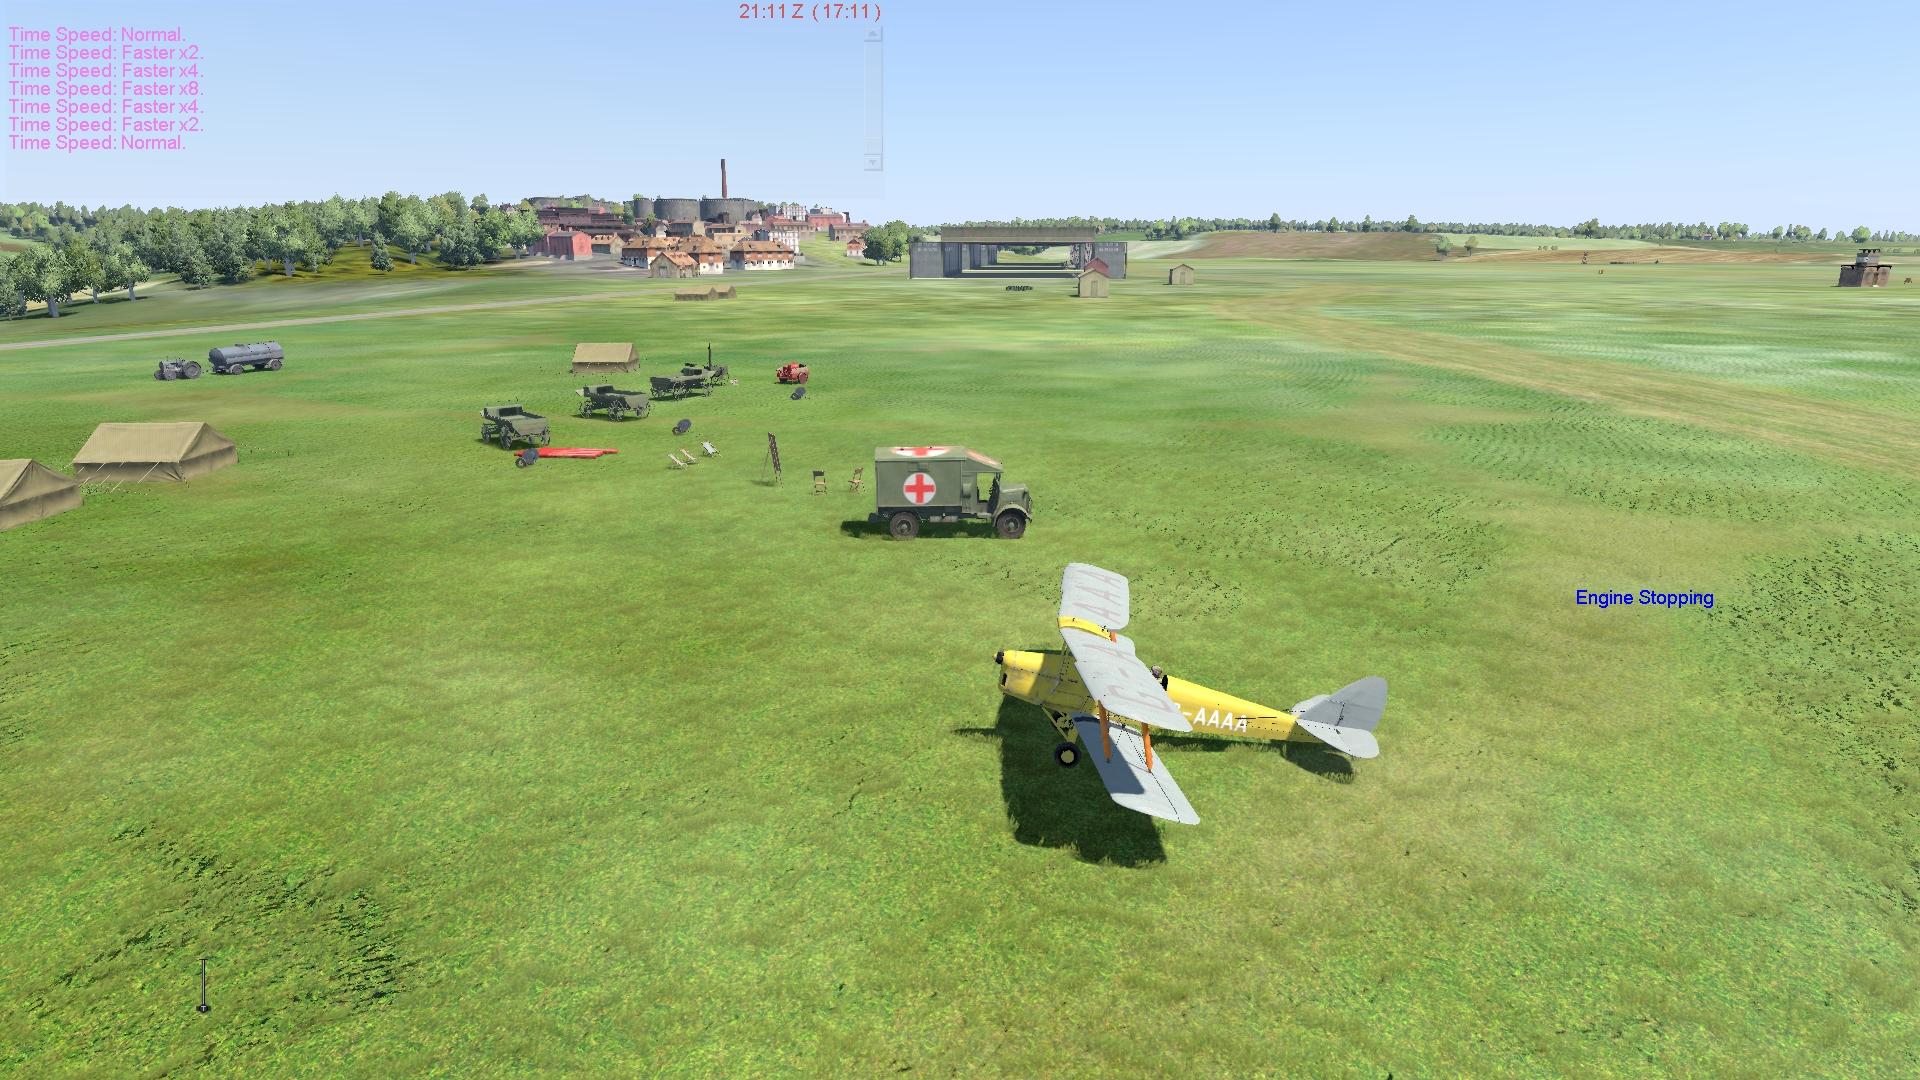 COD Tiger Moth airfield